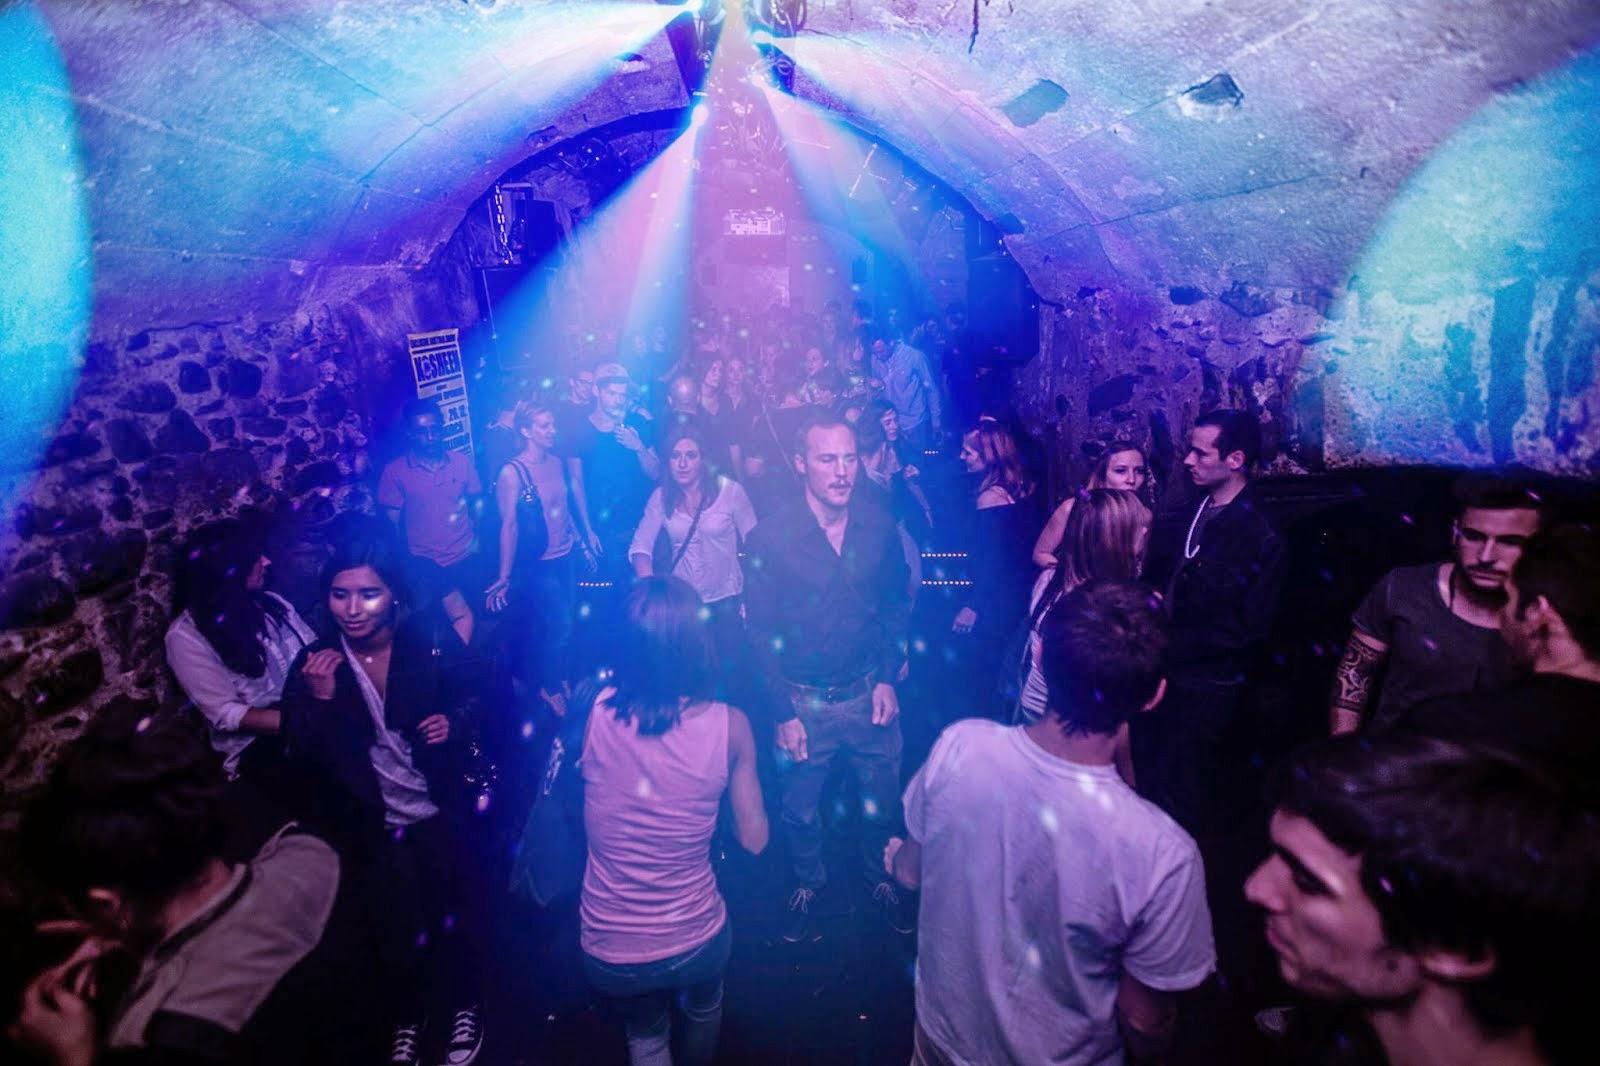 vorhausberg party rauchclub